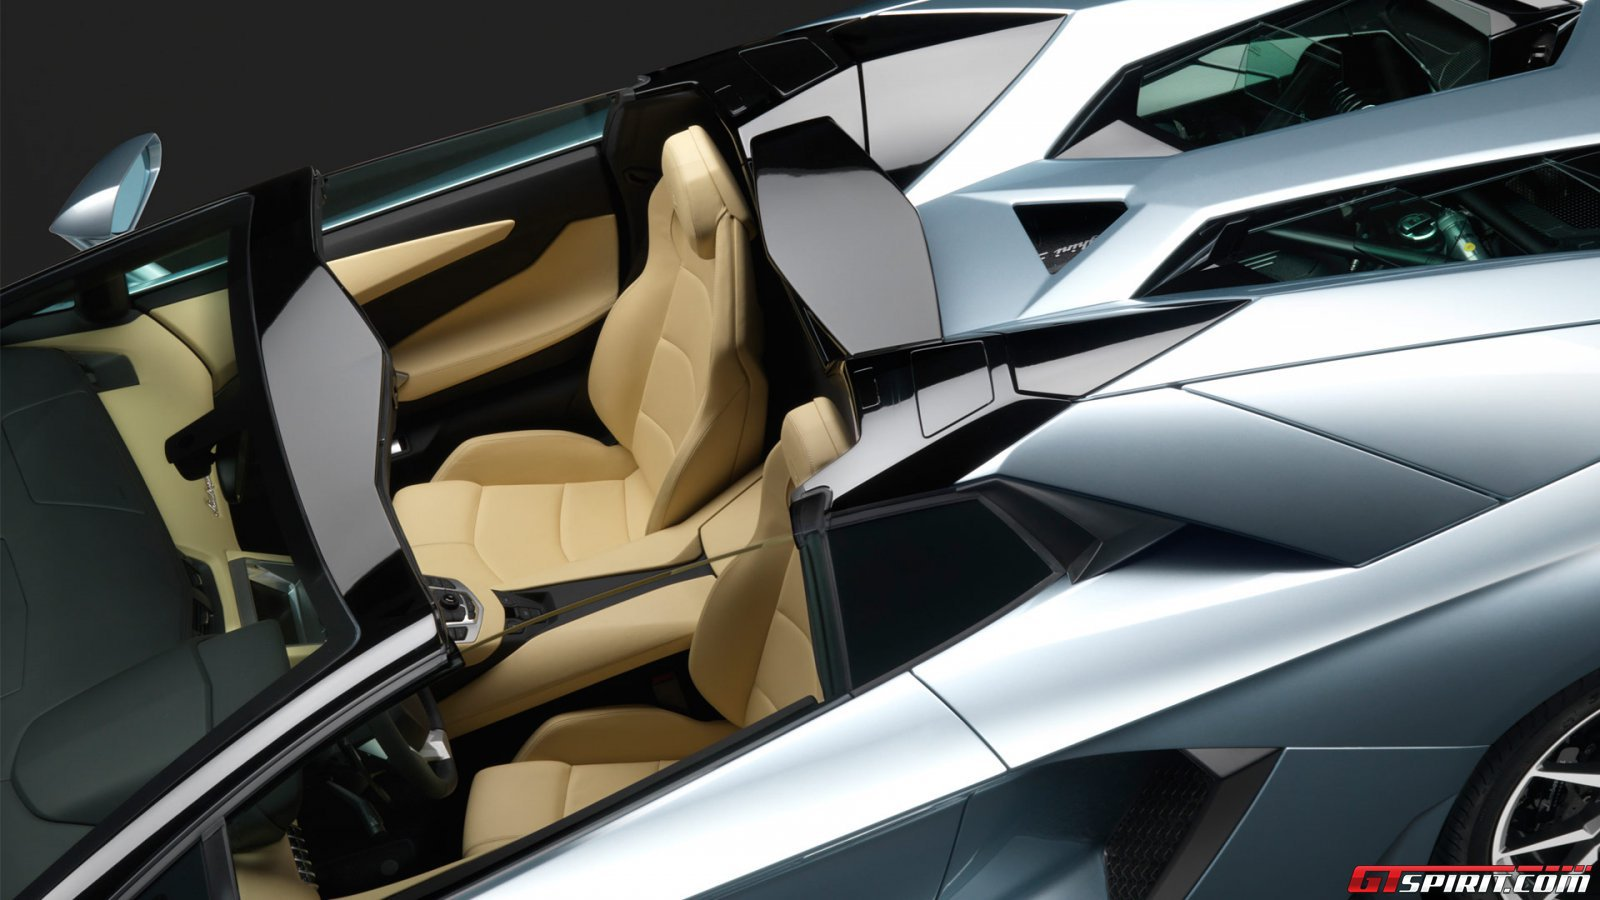 2013 Lamborghini Aventador LP700-4 Roadster Photo 8